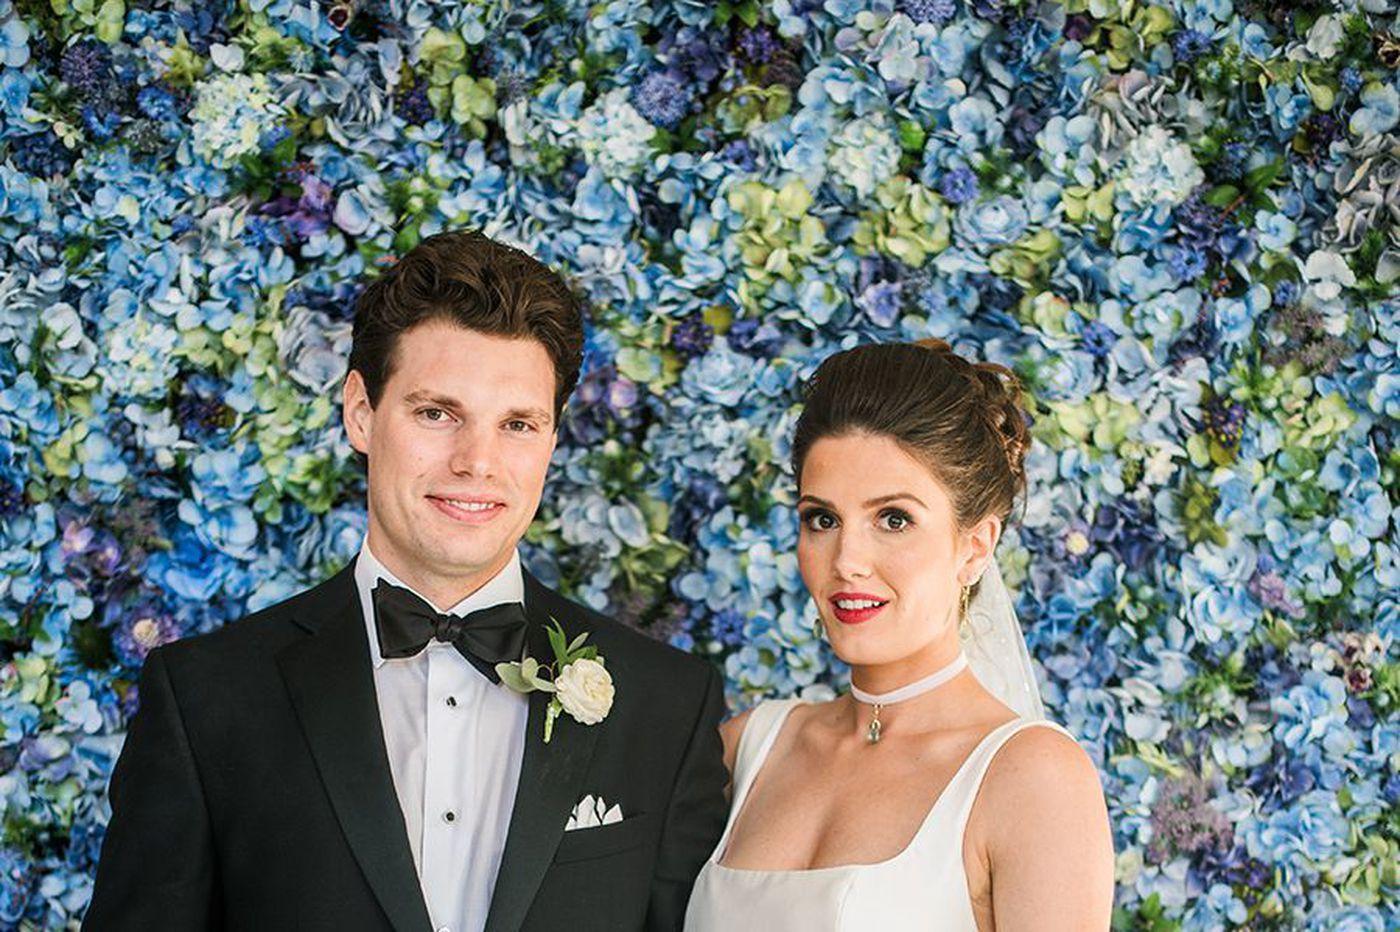 Philadelphia weddings: Kristen Kelly and Michael Moriarty Jr